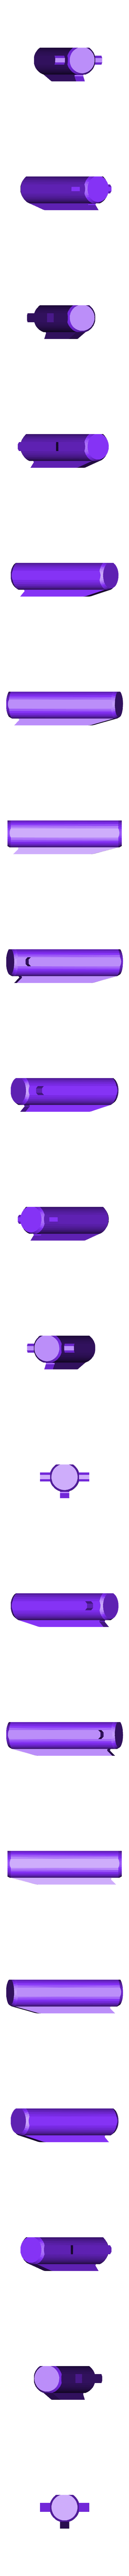 Nerfpistol_pinslide.STL Download STL file Nerf pistol with clip • 3D printer design, MrCrankyface